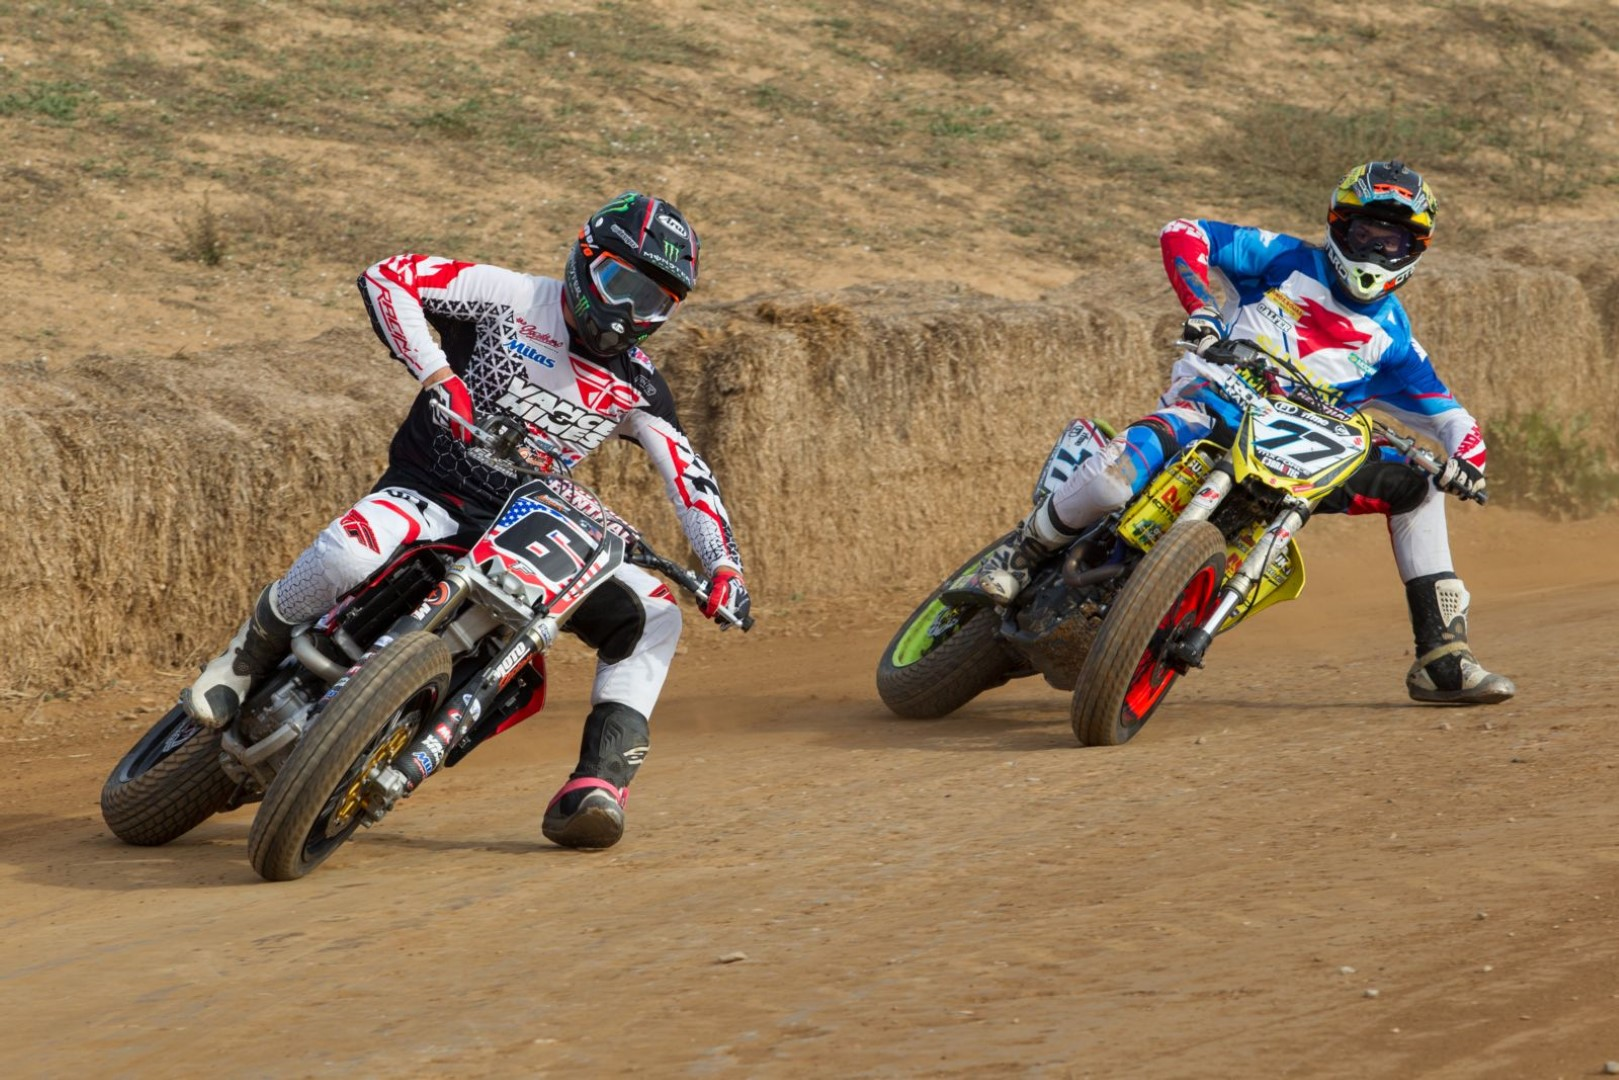 Los españoles Ferrán Cardús y Franc Serra en el American Flat Track